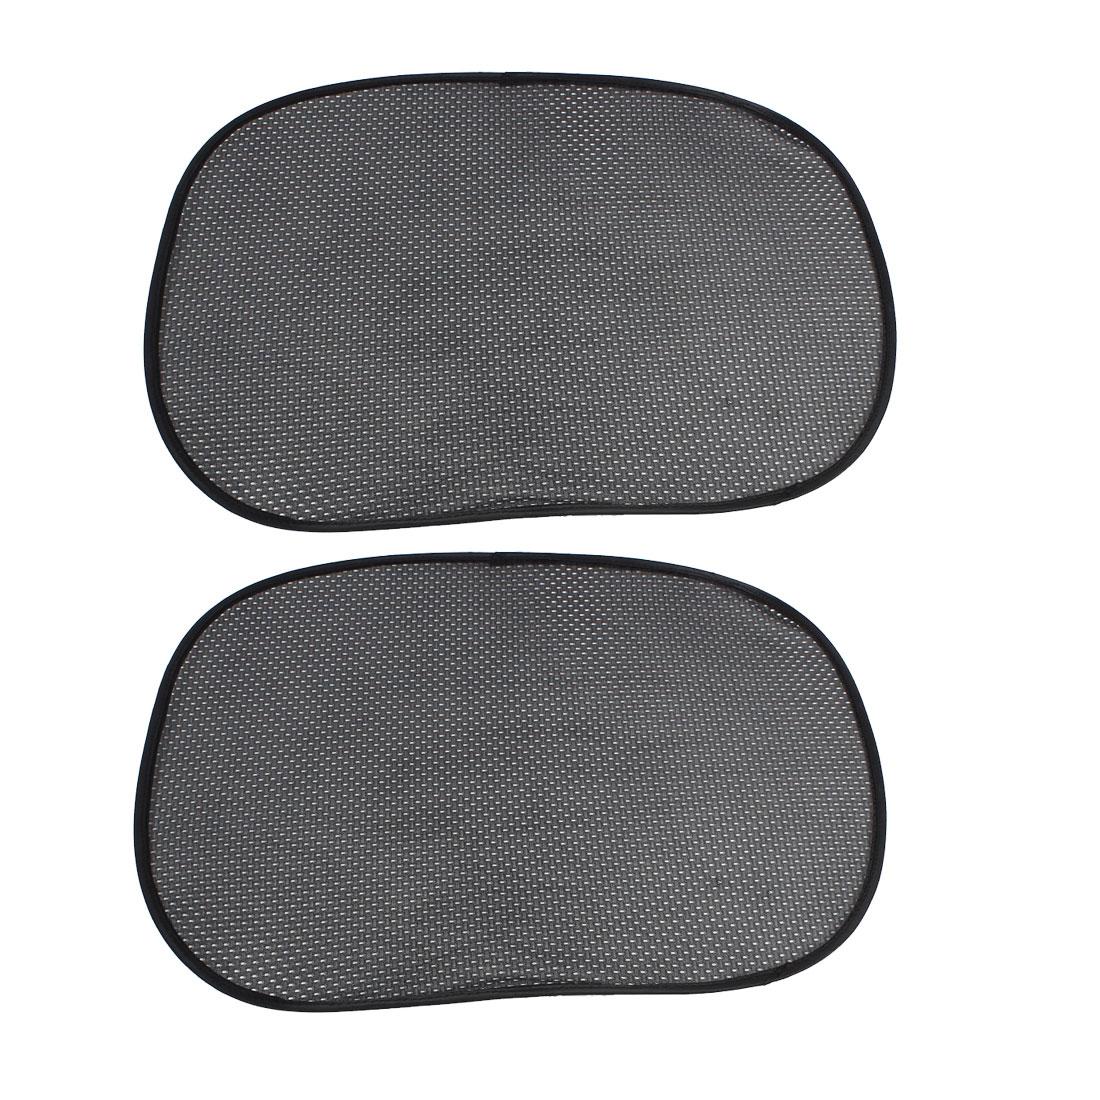 Car Side Window Windshield Foldable Mesh Sunshade Shield Cover Visor Black 2Pcs